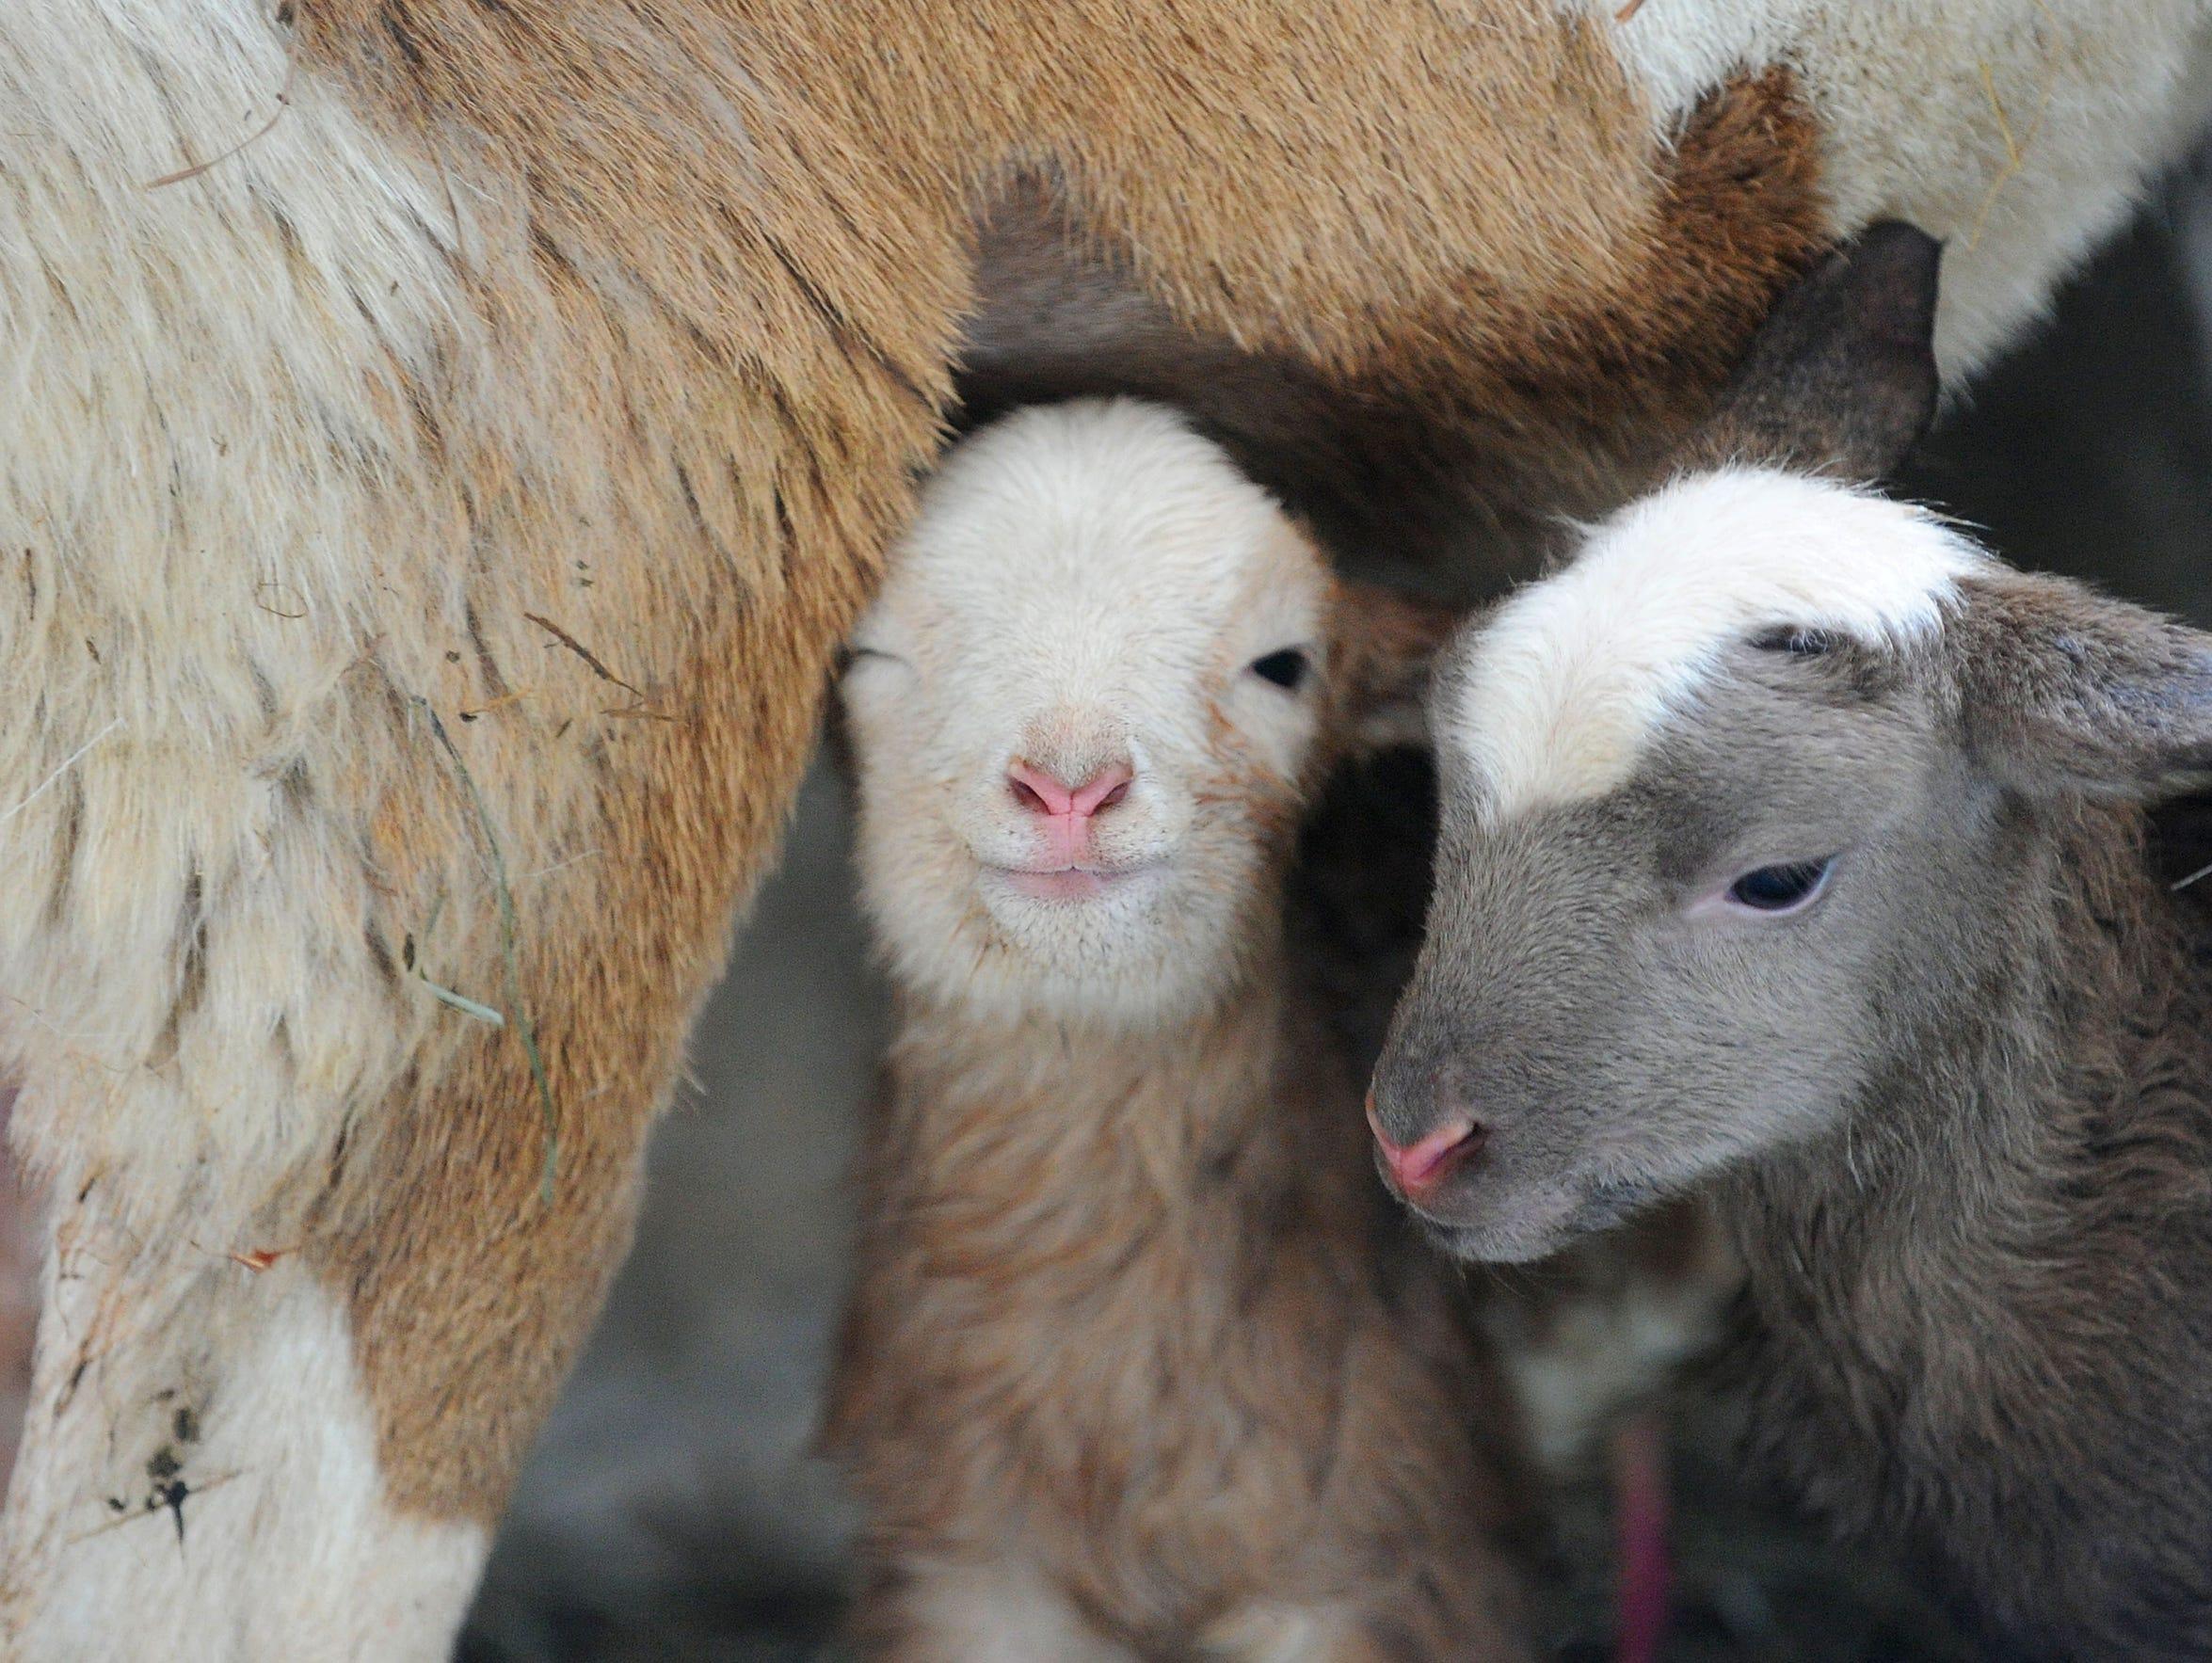 It is lambing season in Highland County. Twin lambs